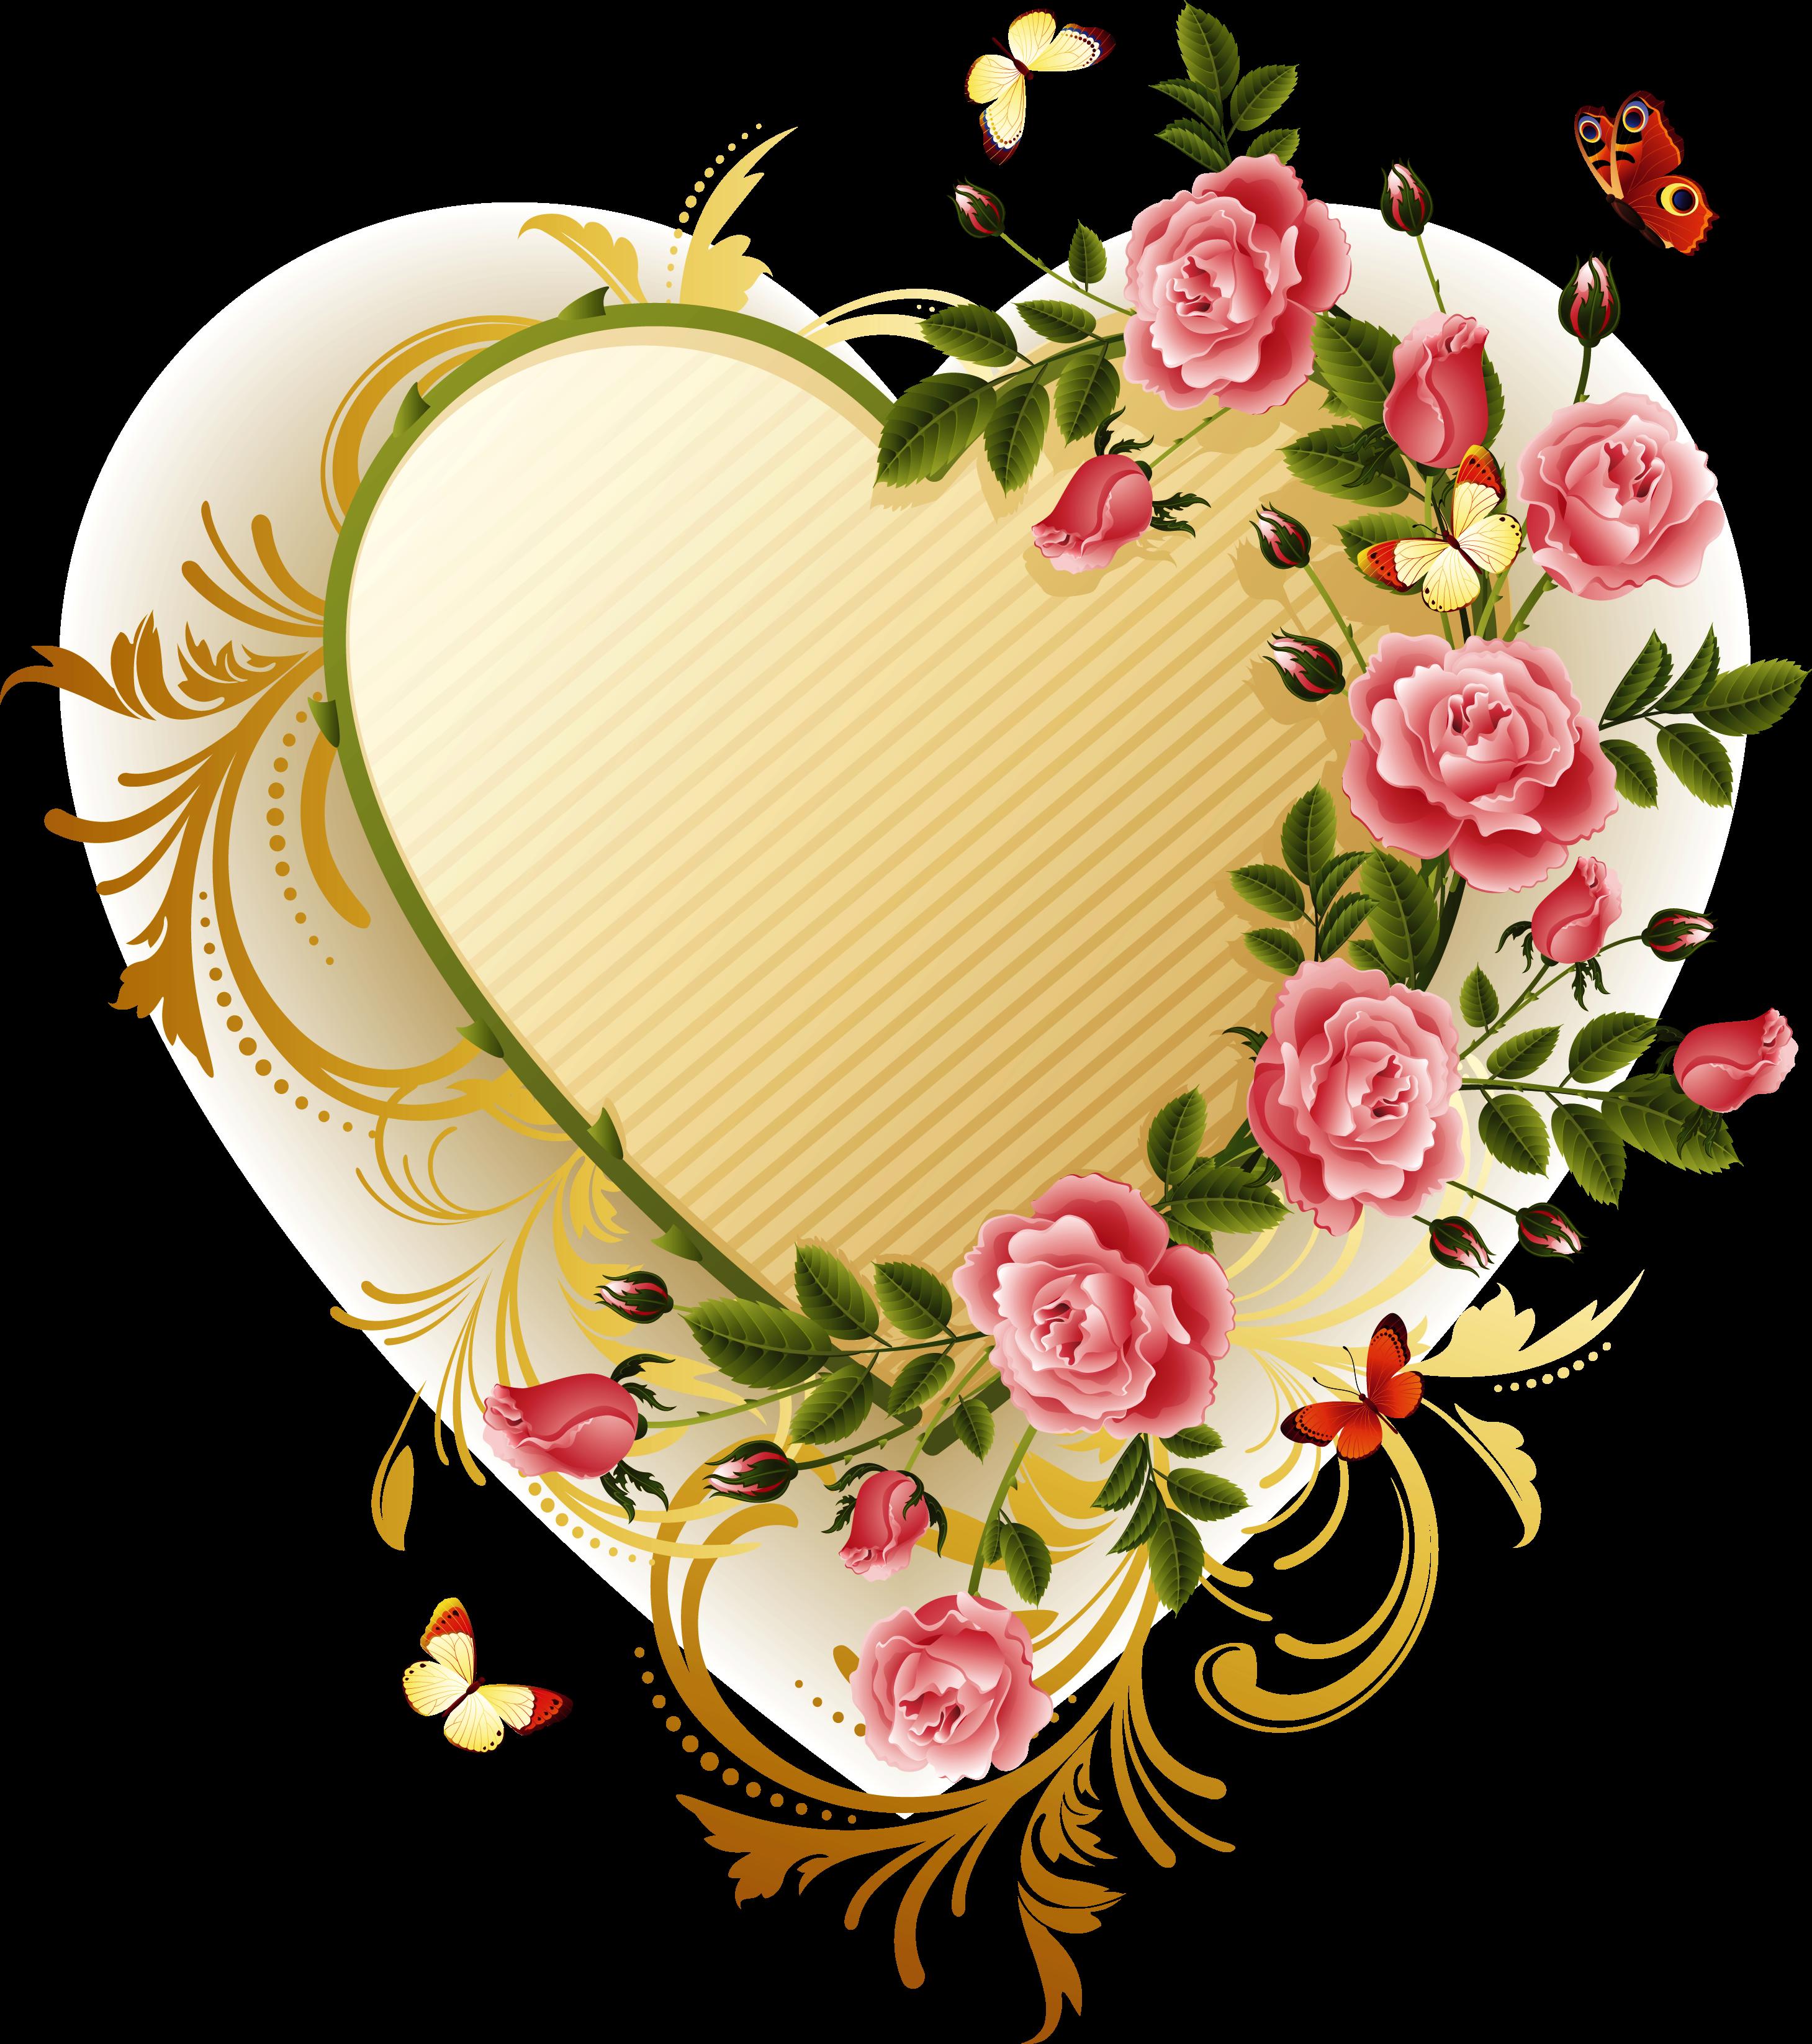 Pin by * FATMA * on YAZI FONLARI | Pinterest | Flower